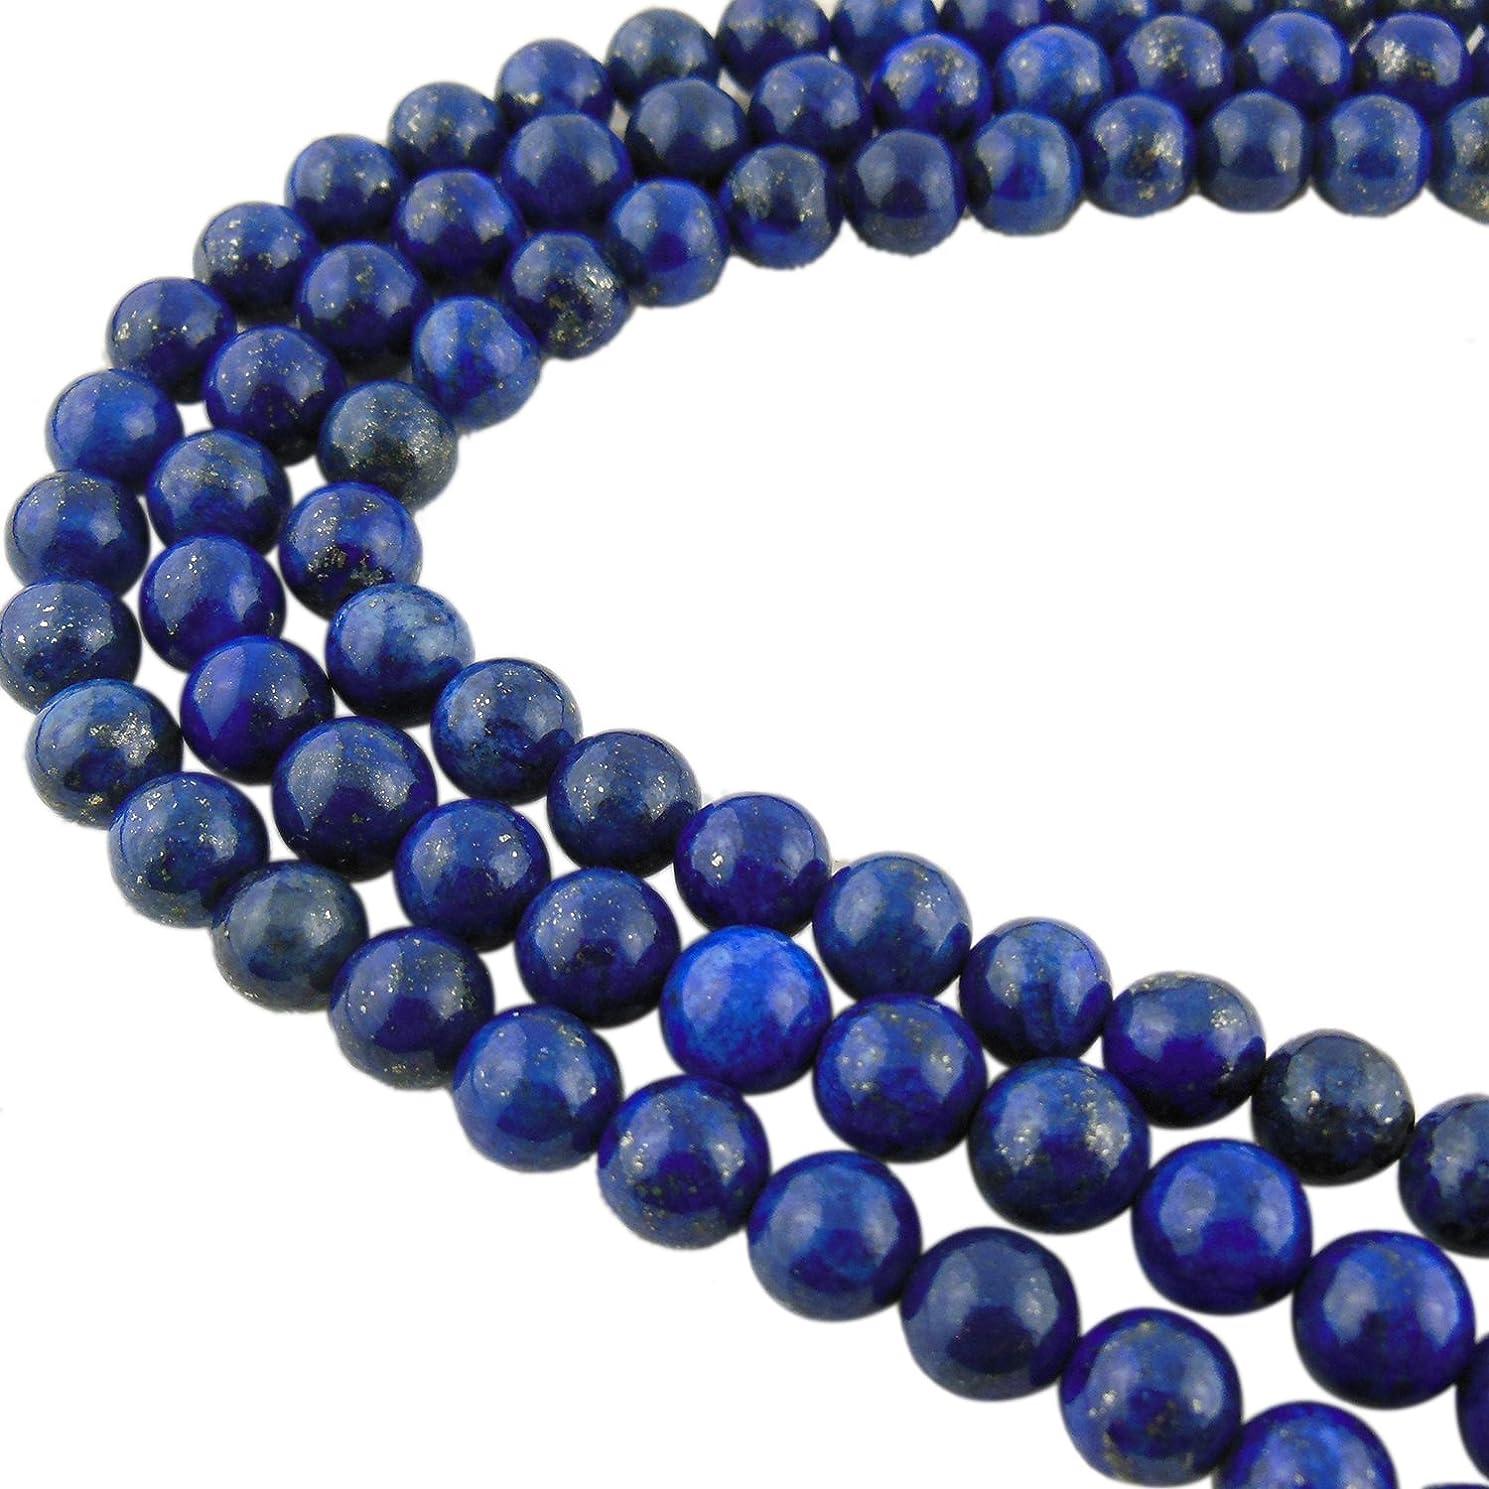 6MM Natural Lapis Lazuli Gemstone Gem Round Loose Stone Beads for Jewelry Making&DIY&Design (RS-1006-6)